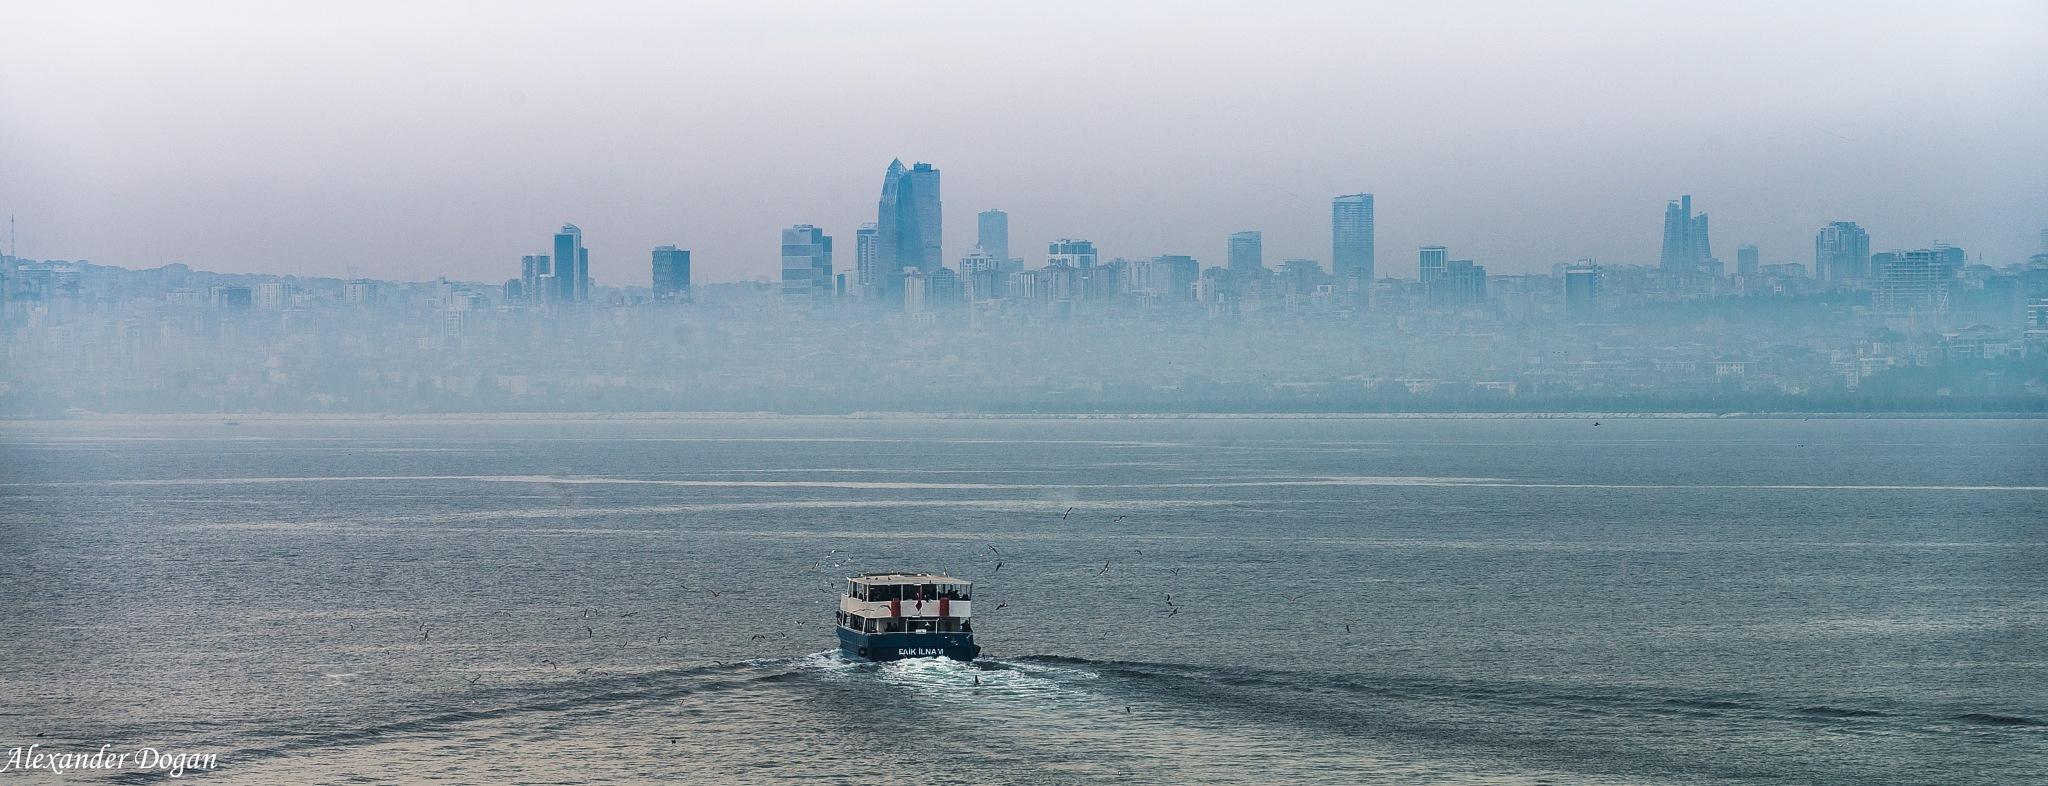 Fog over skyline of Istanbul. by Alexander Dogan